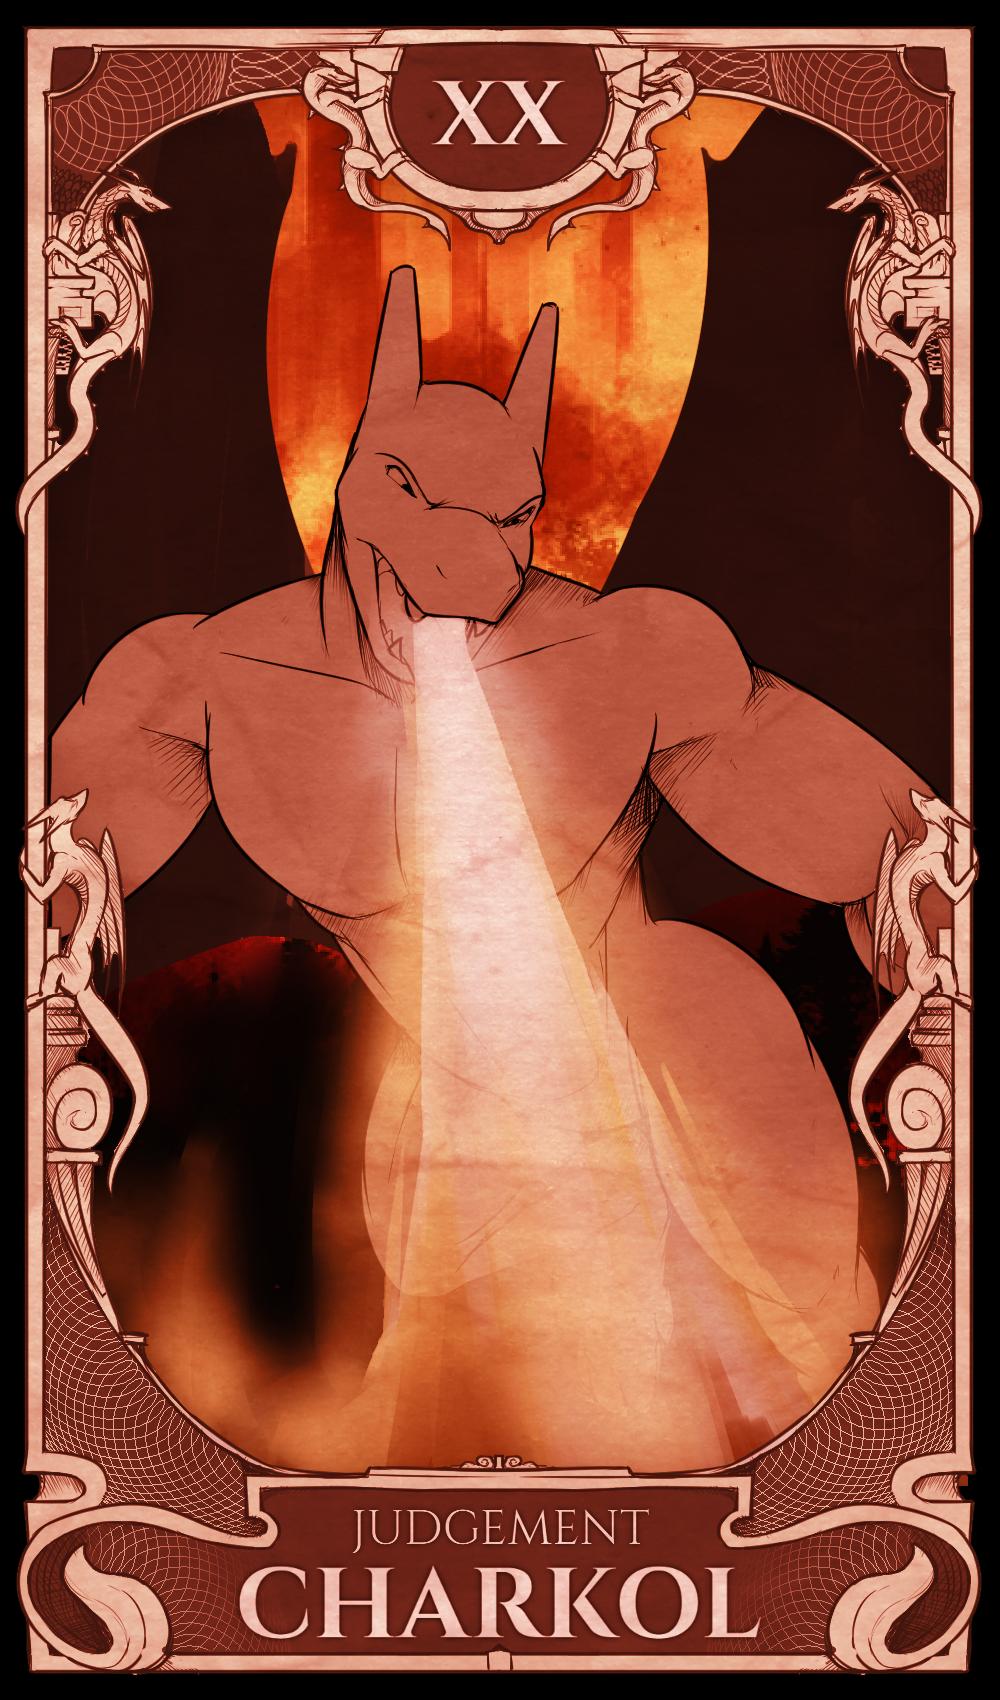 Tarot Card: Judgement (by TankH)